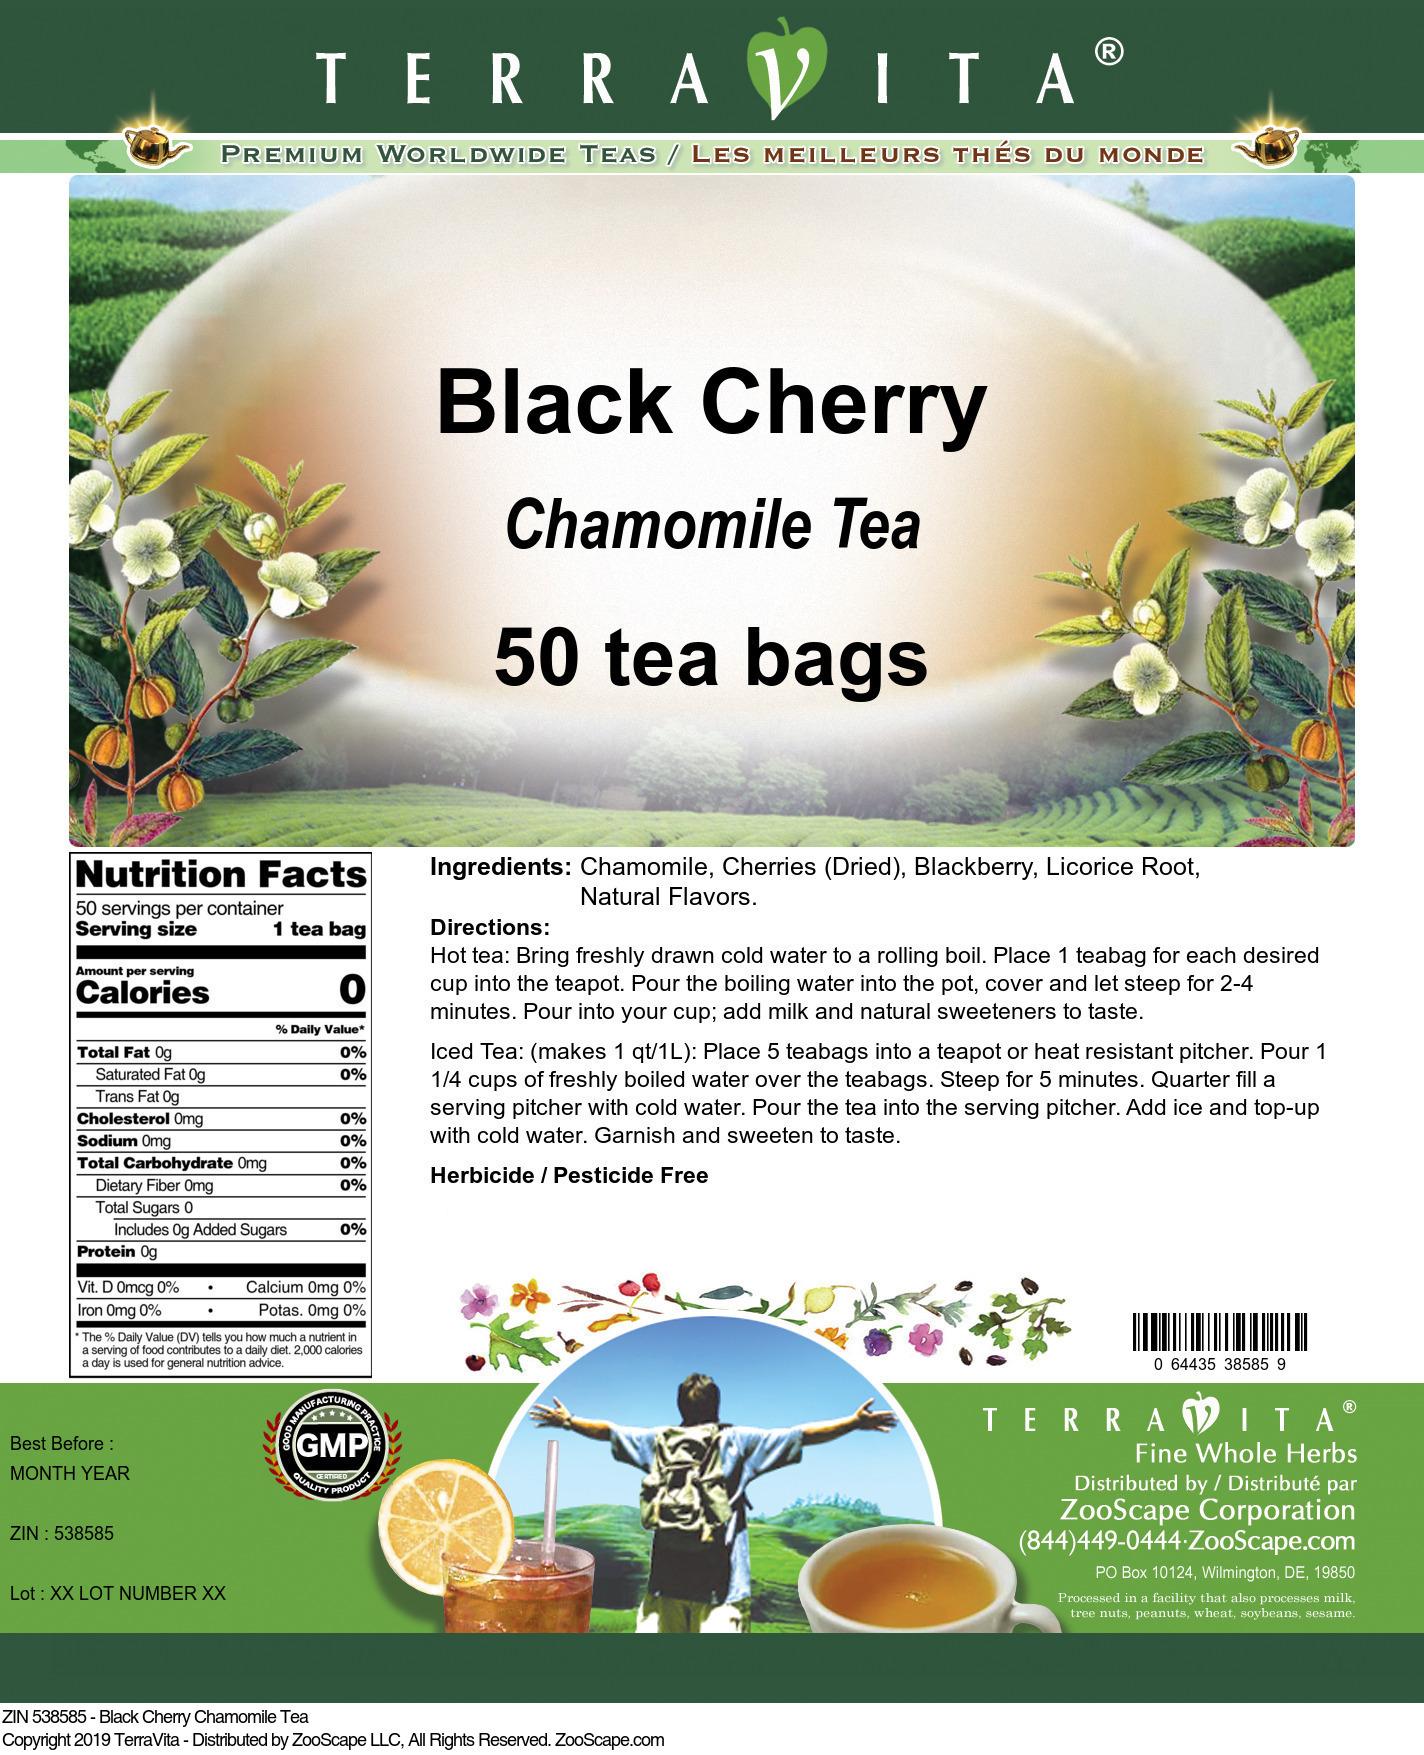 Black Cherry Chamomile Tea